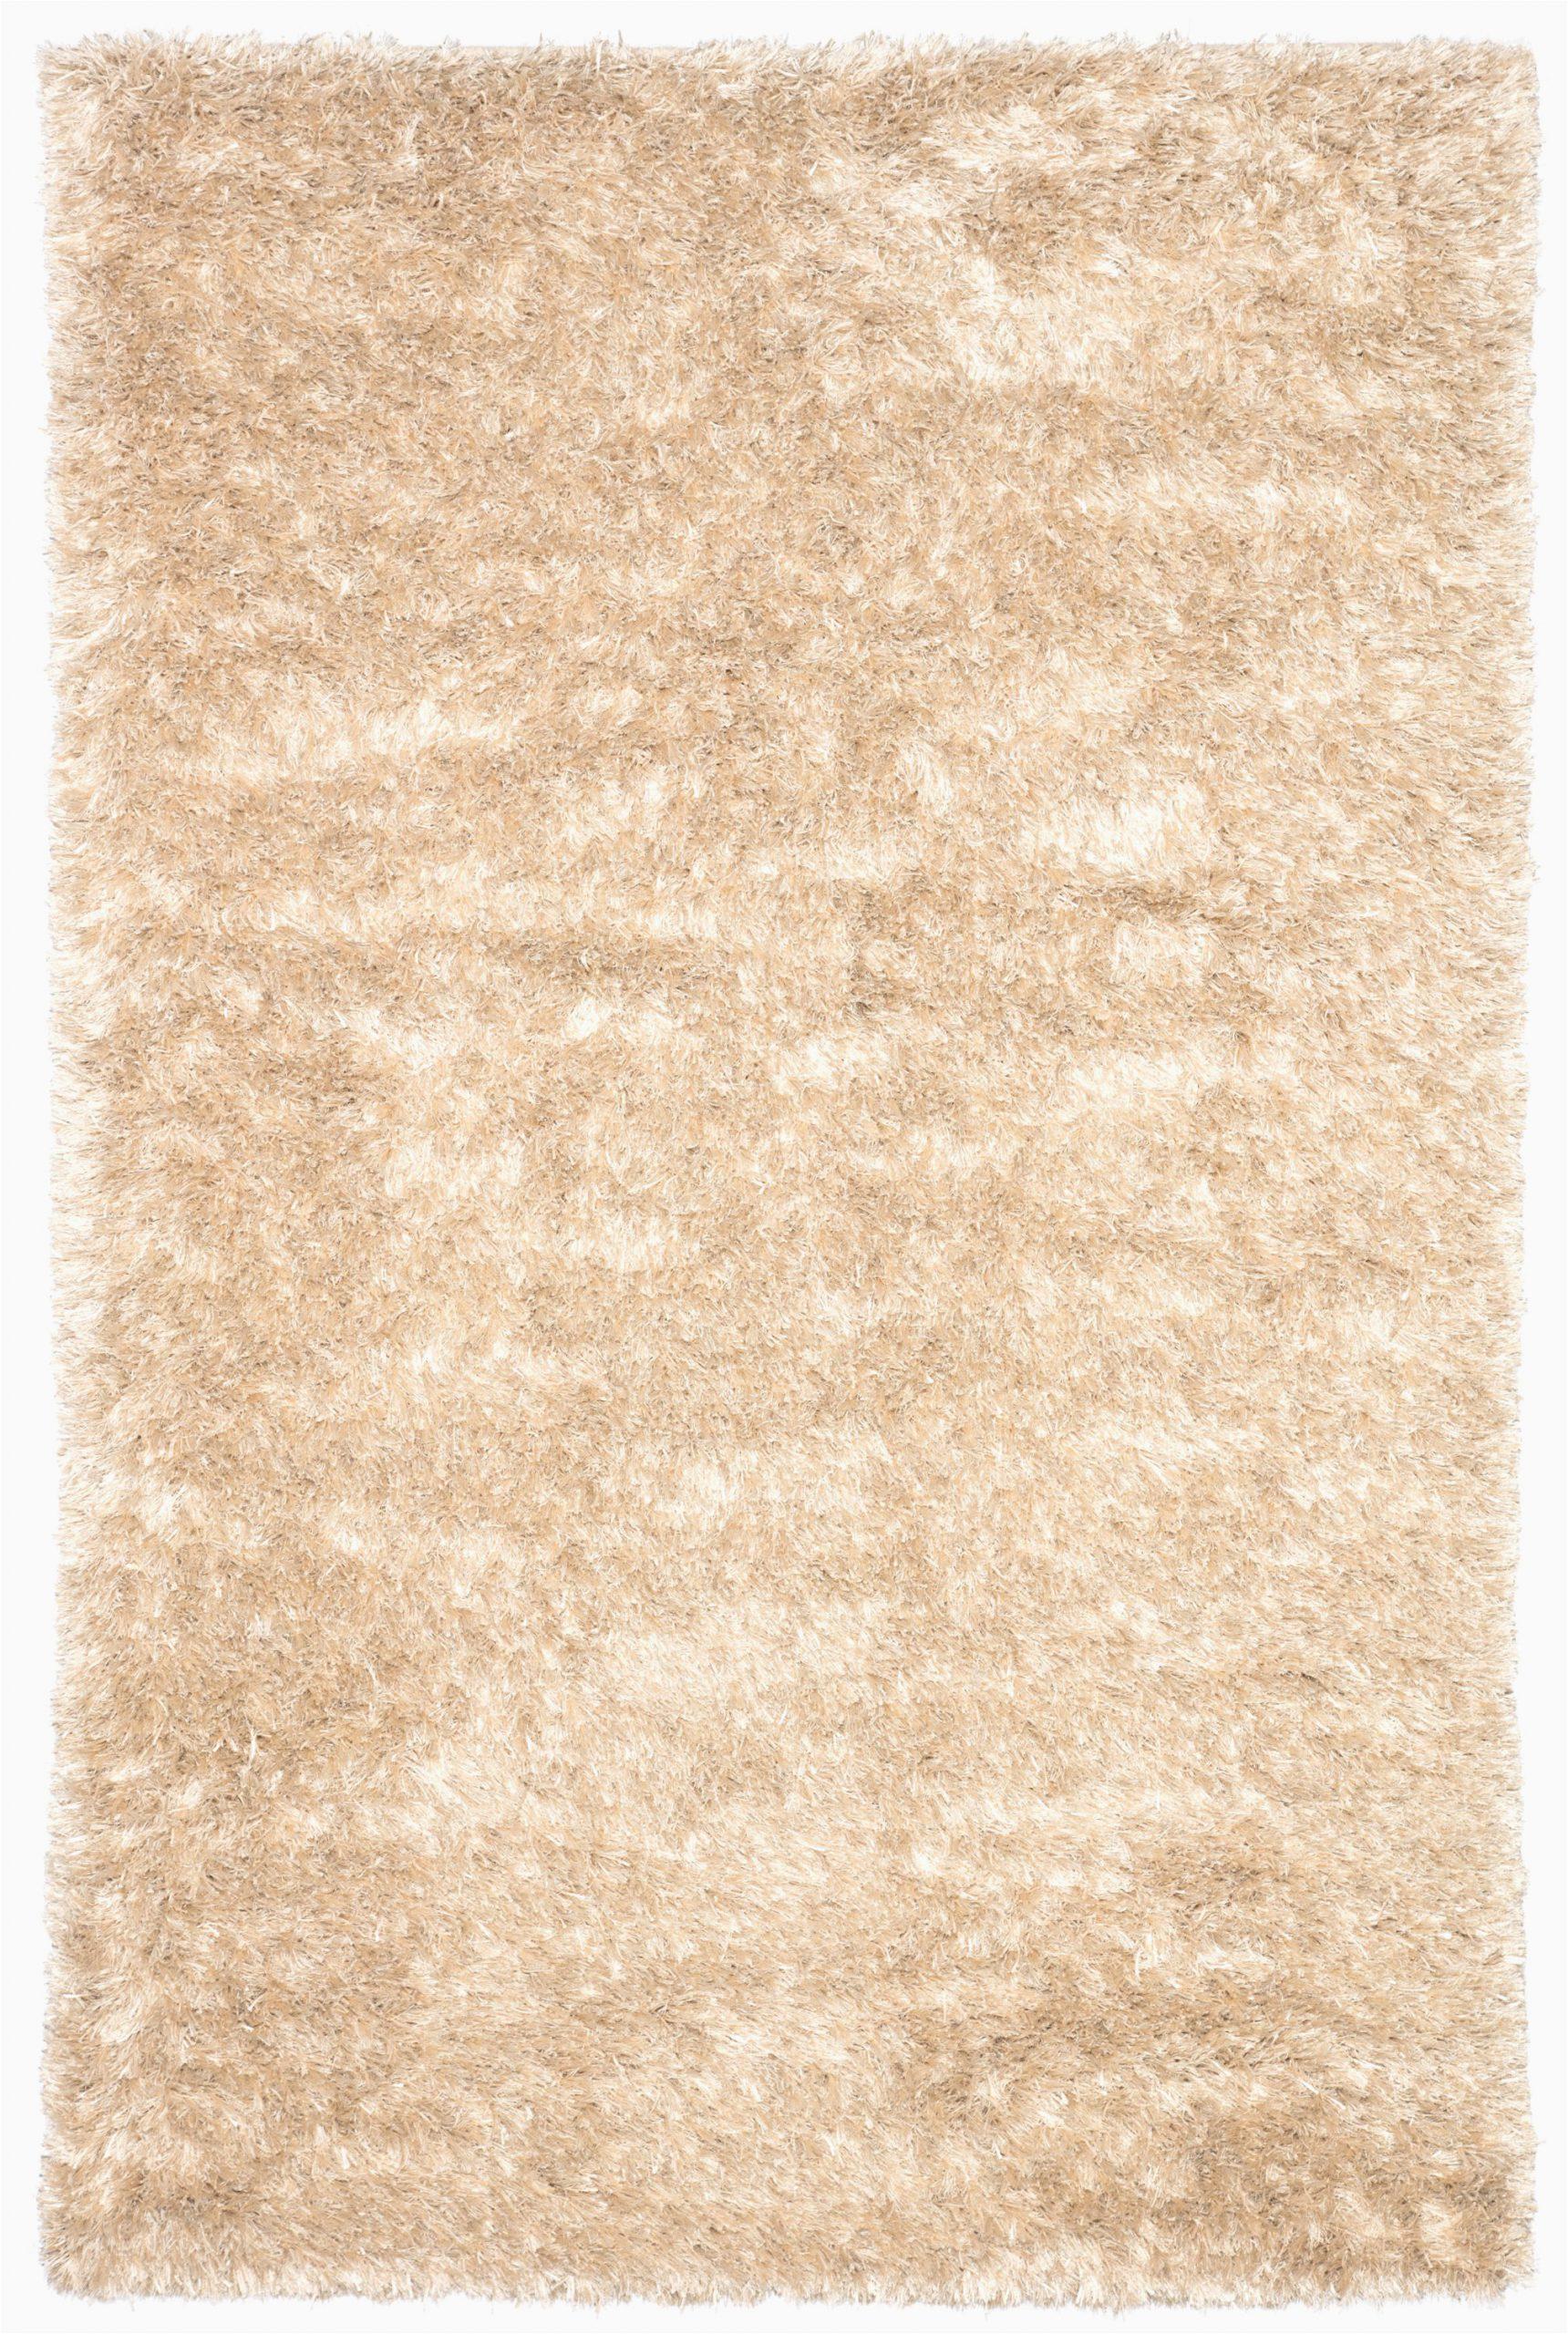 ebern designs lilia handmade shag whitecap greywhite swan area rug ende1889 piid=